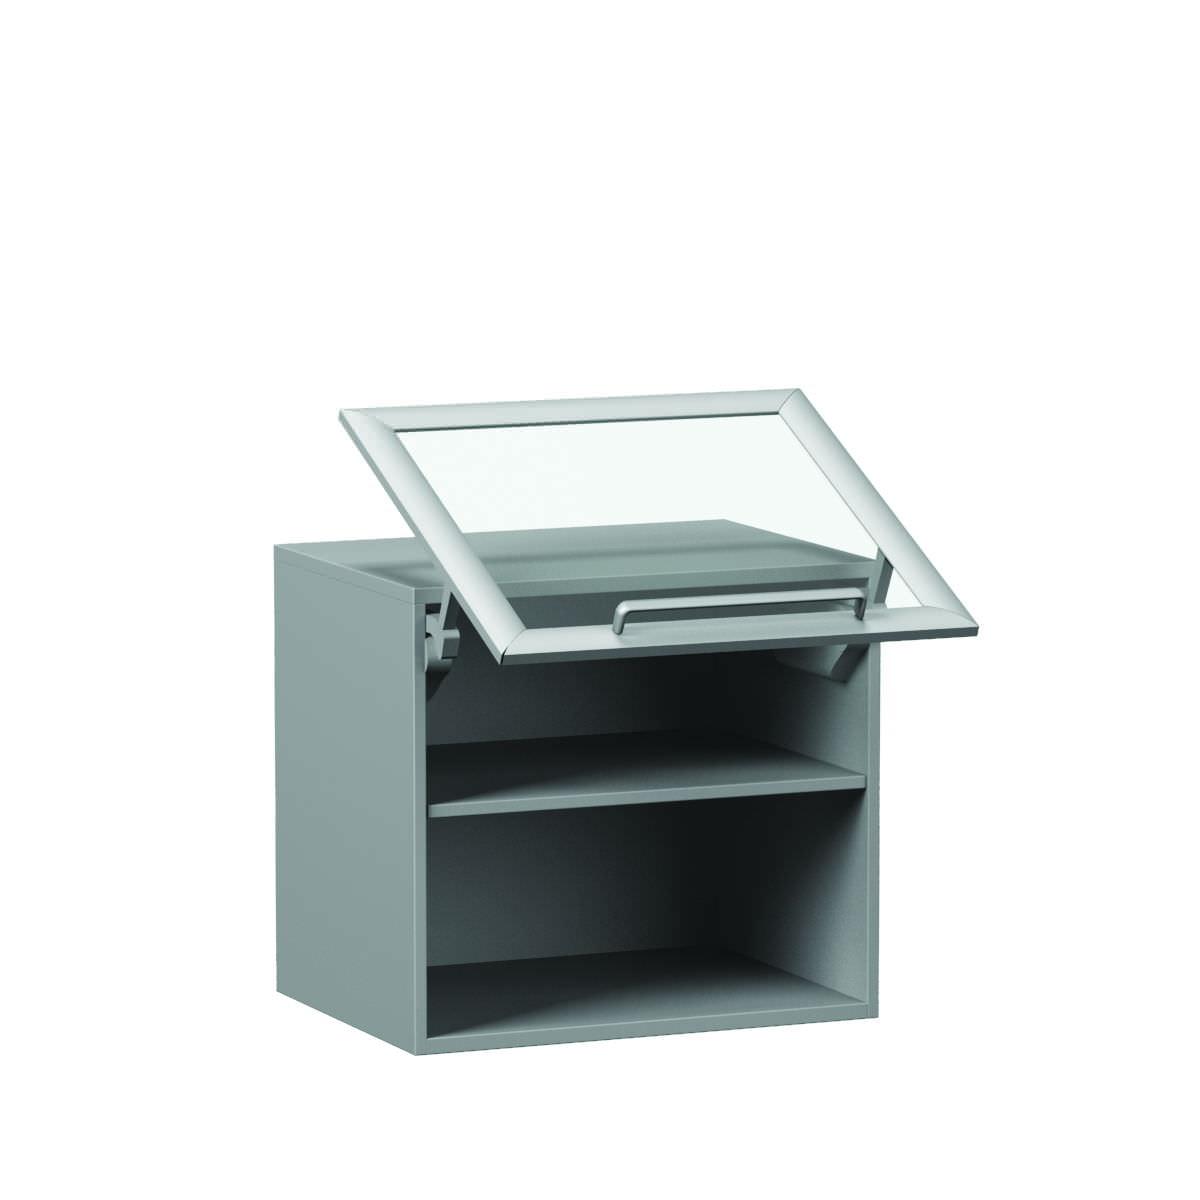 Шкаф навесной ДМ-4-002-13